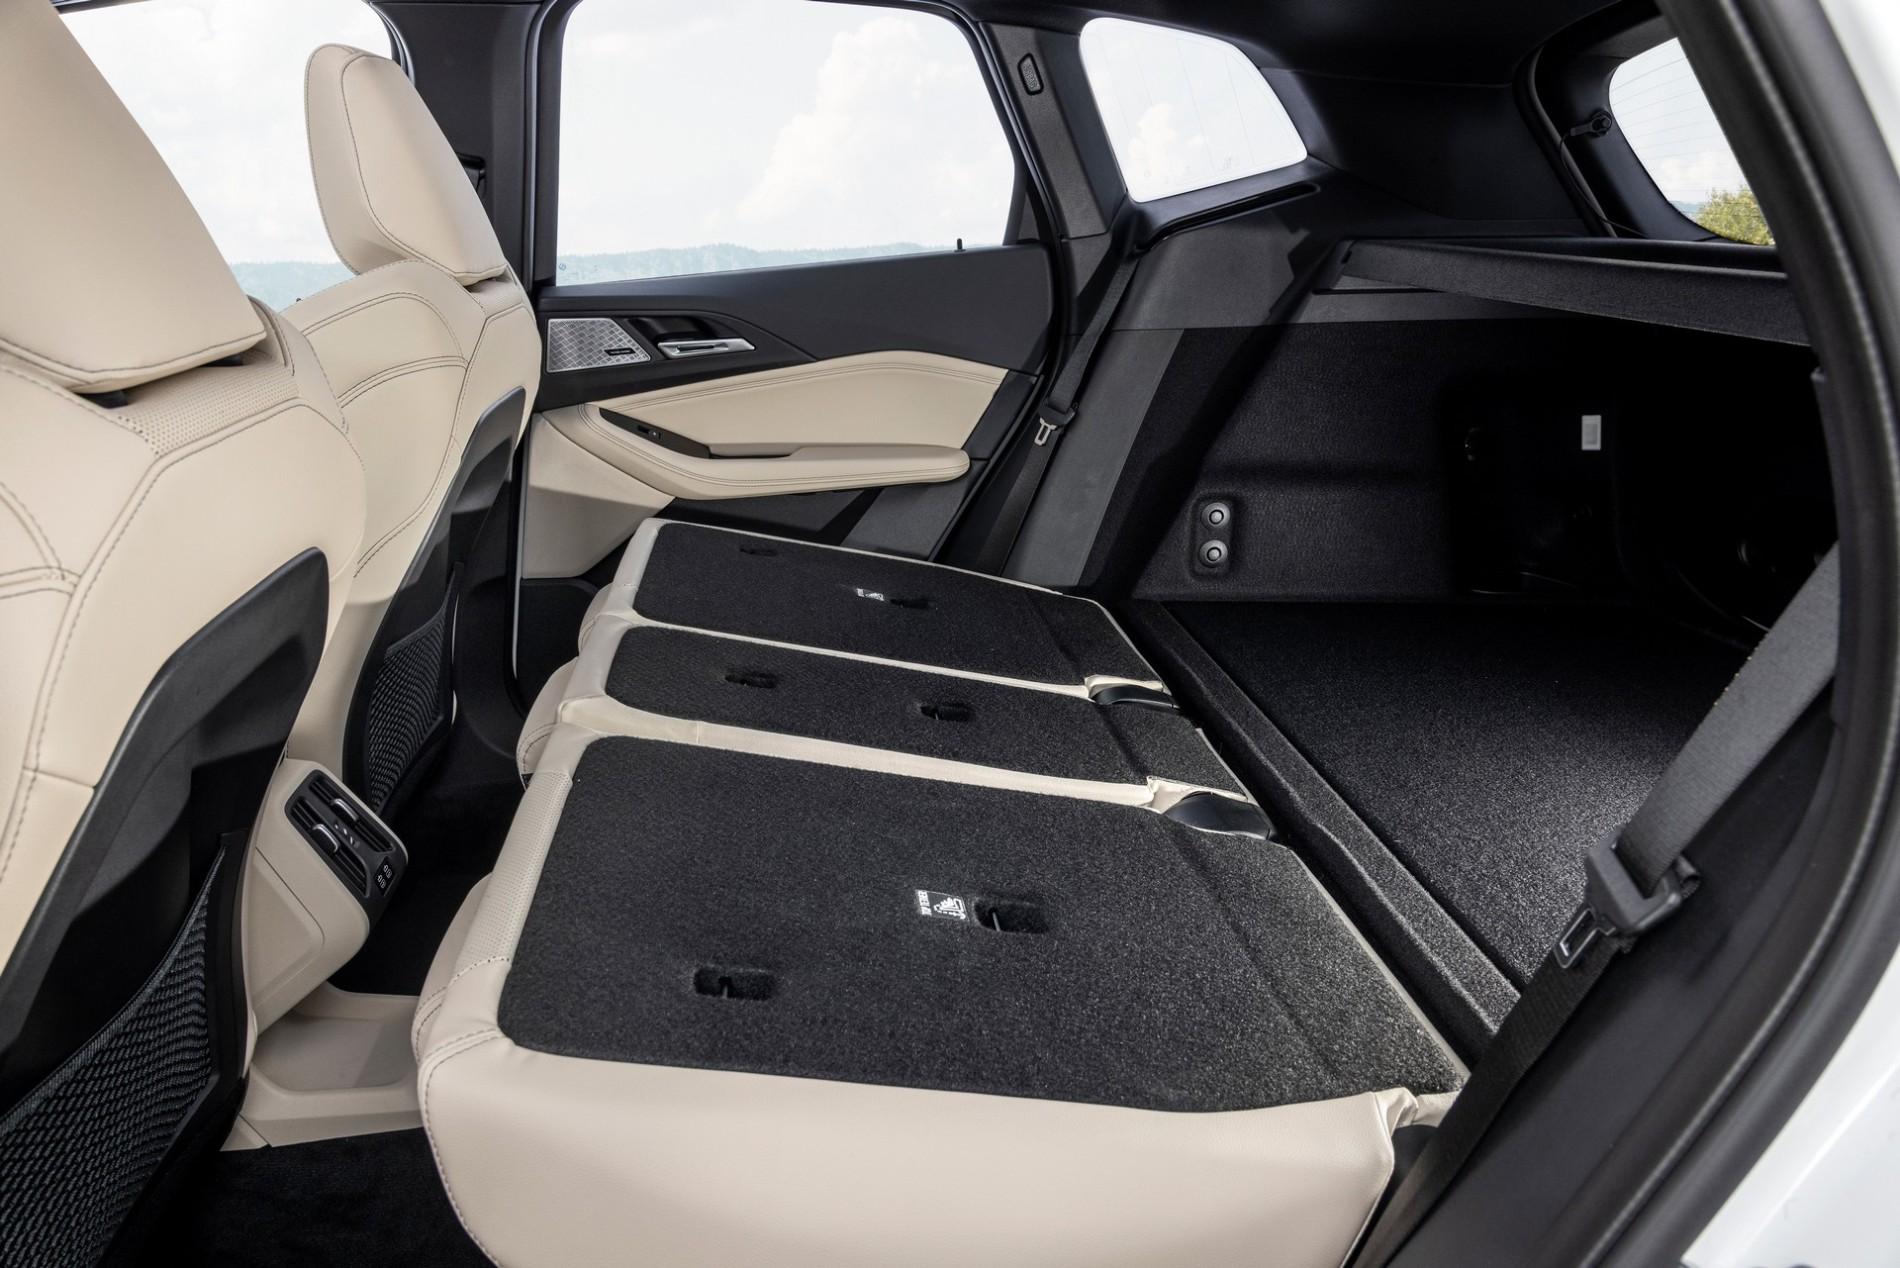 BMW Seria 2 Active Tourer - BMW Seria 2 Active Tourer